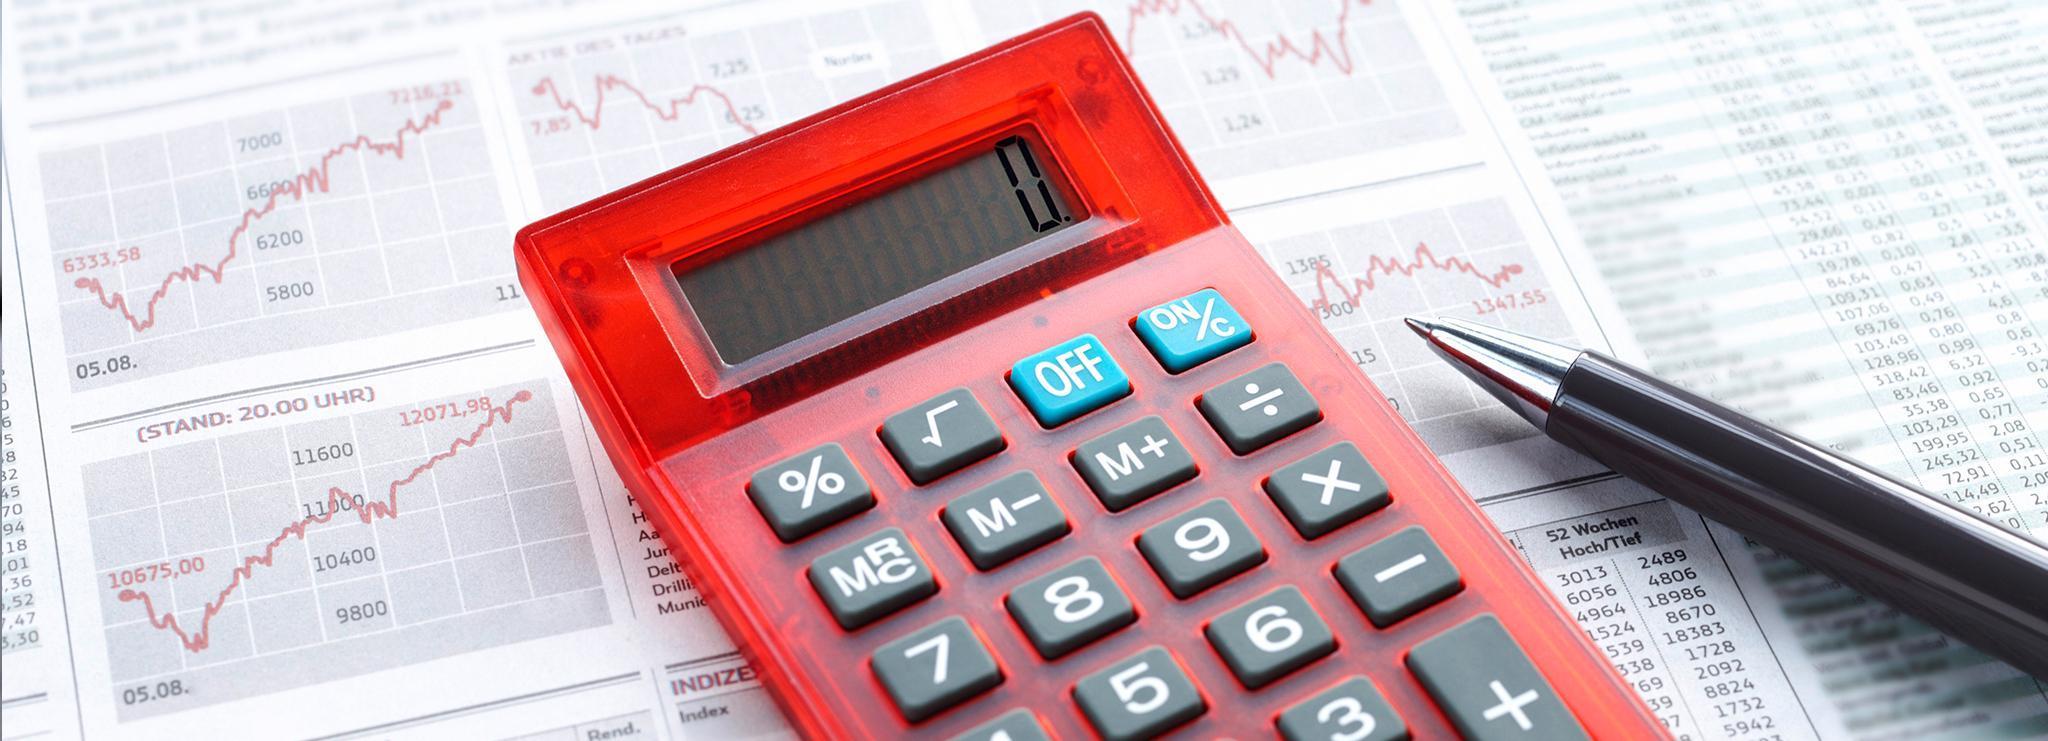 Продажа грузовиков МАН в кредит и лизинг